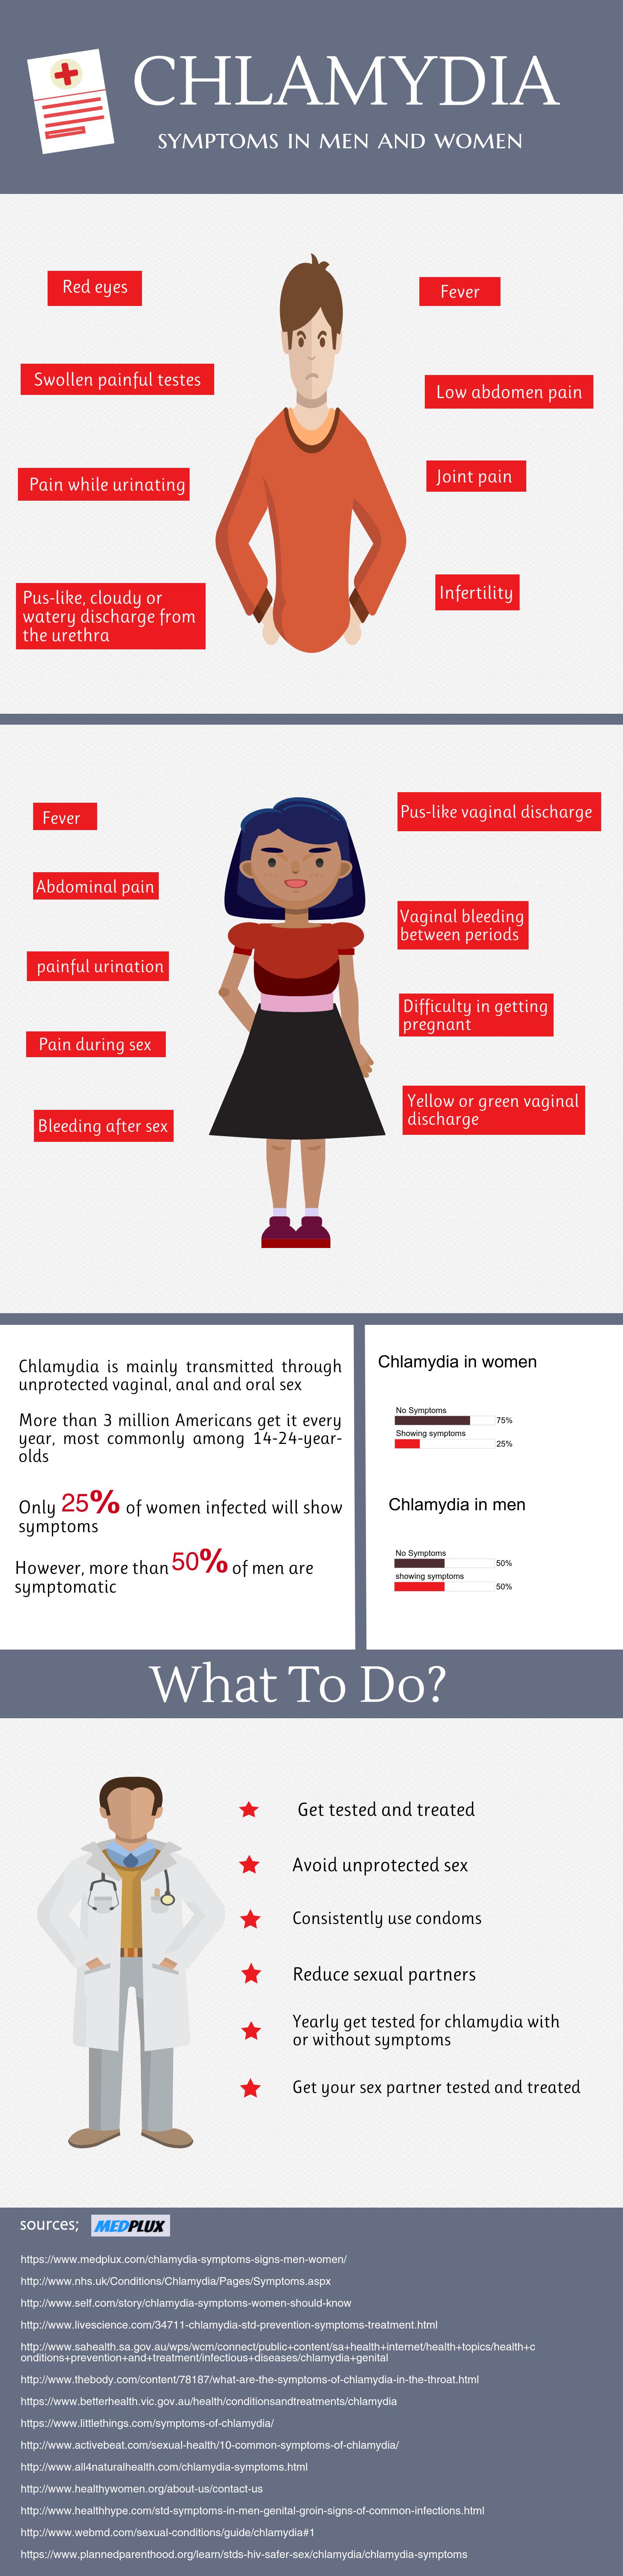 Chlamydia symptoms in men and women